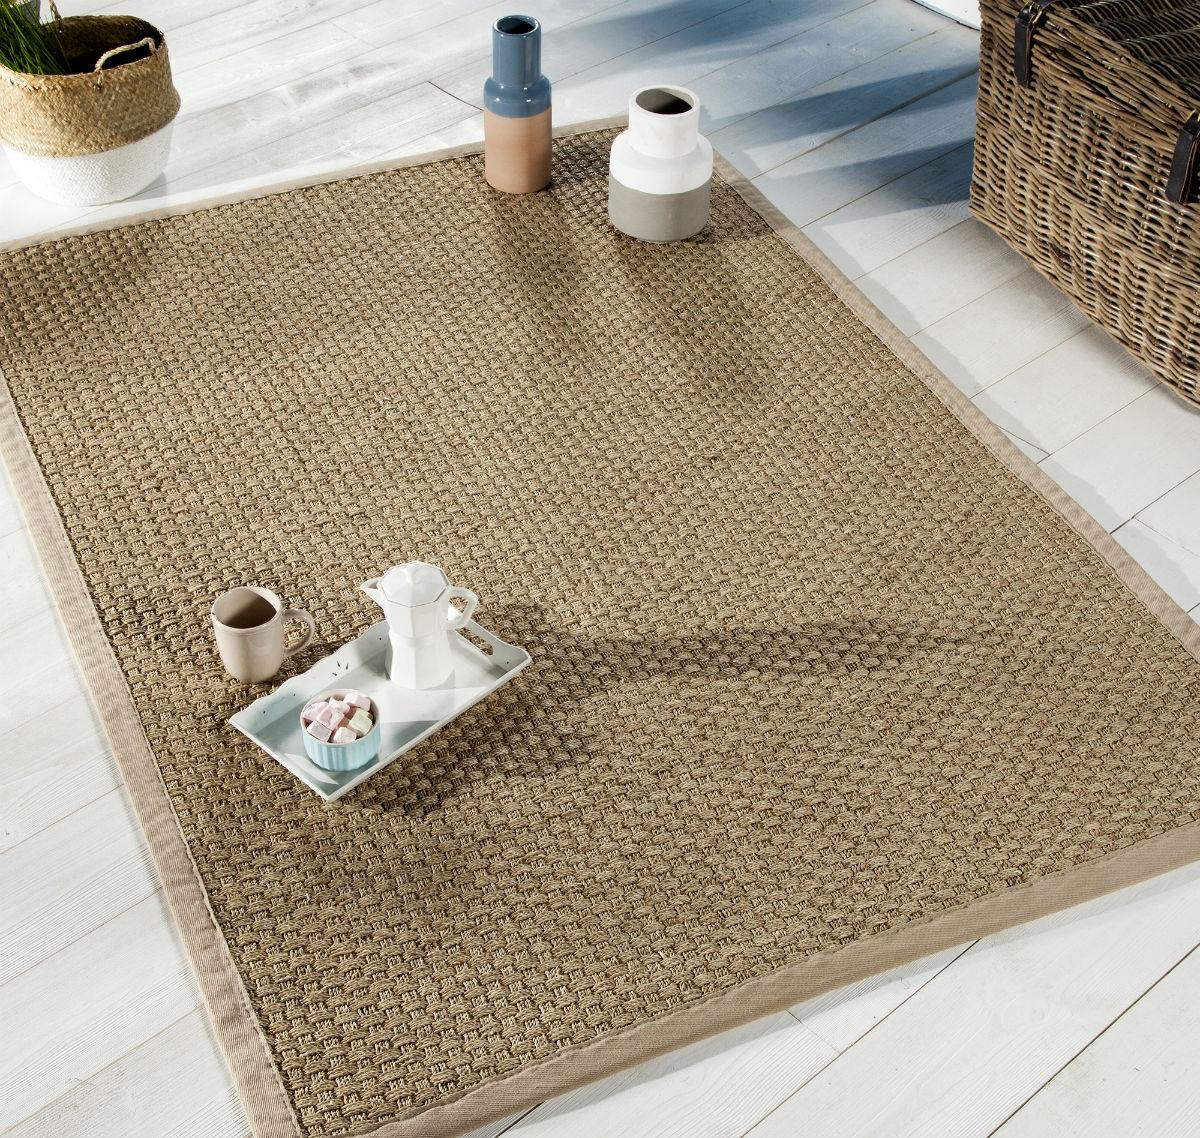 Carrelage design tapis jonc de mer moderne design pour for Jonc de mer cuisine